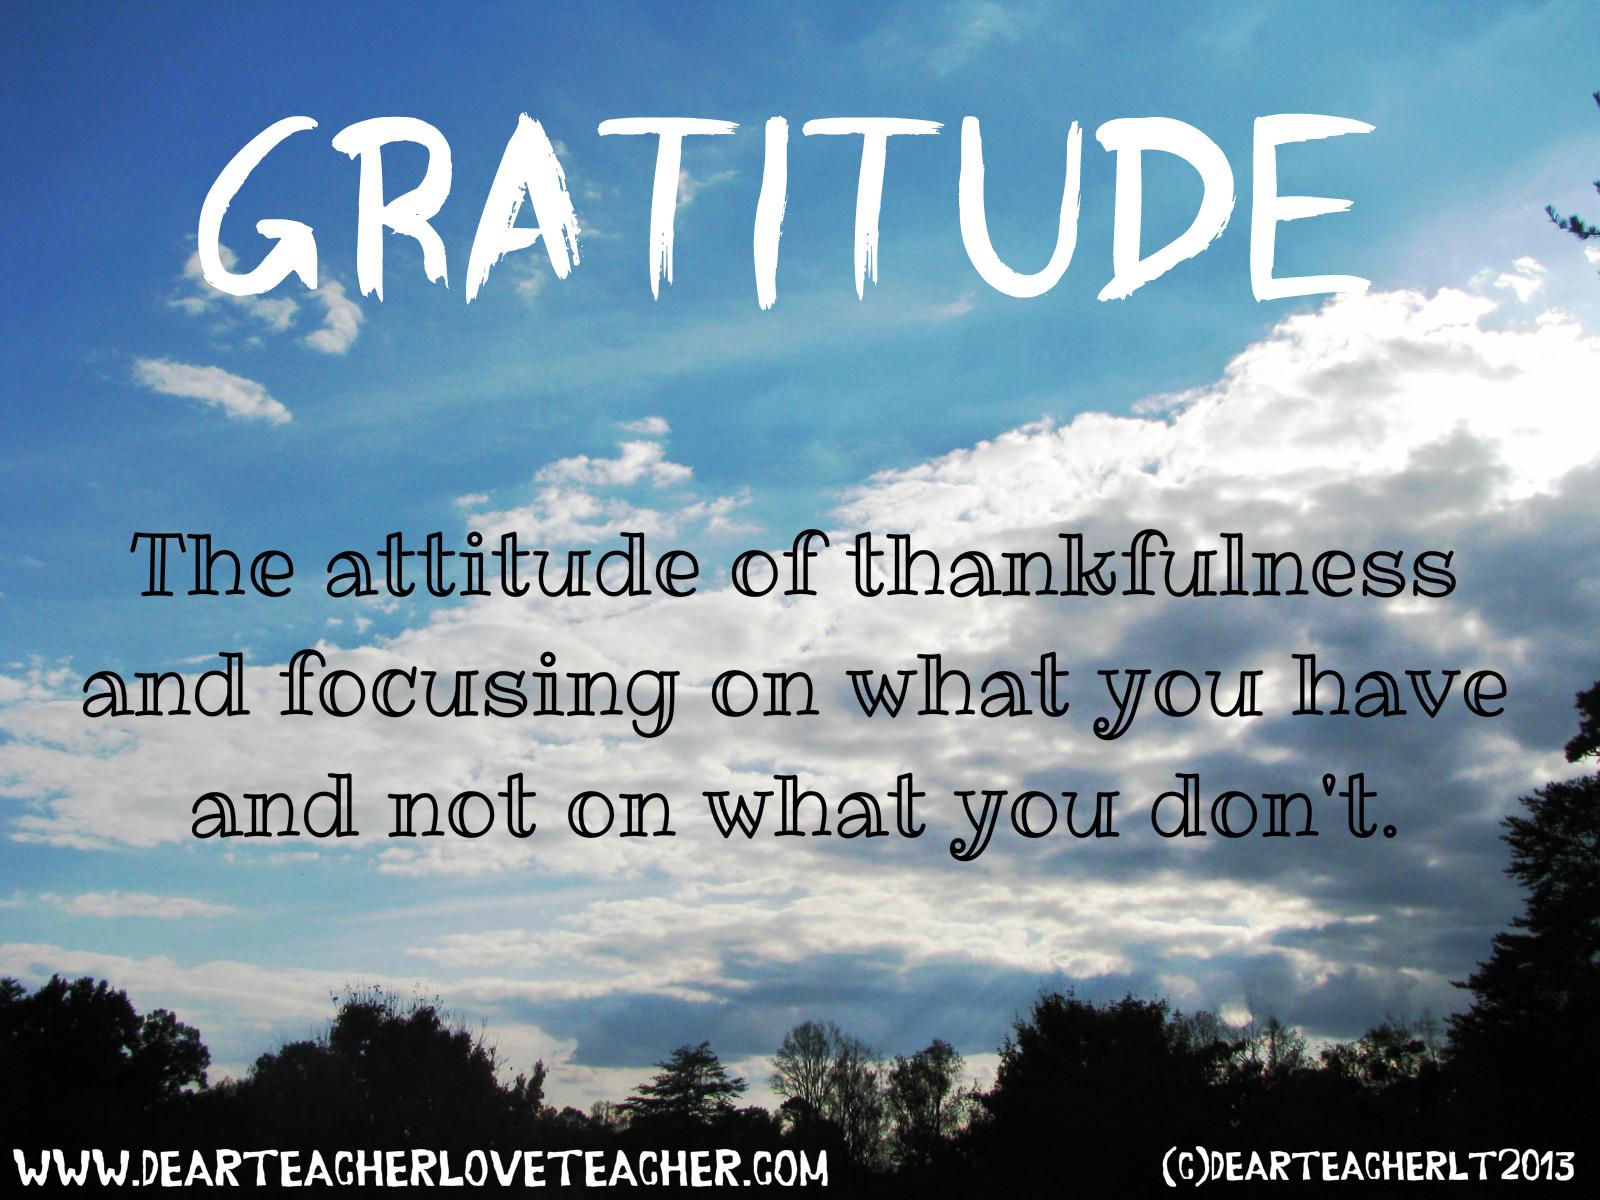 Gratitude to the teacher